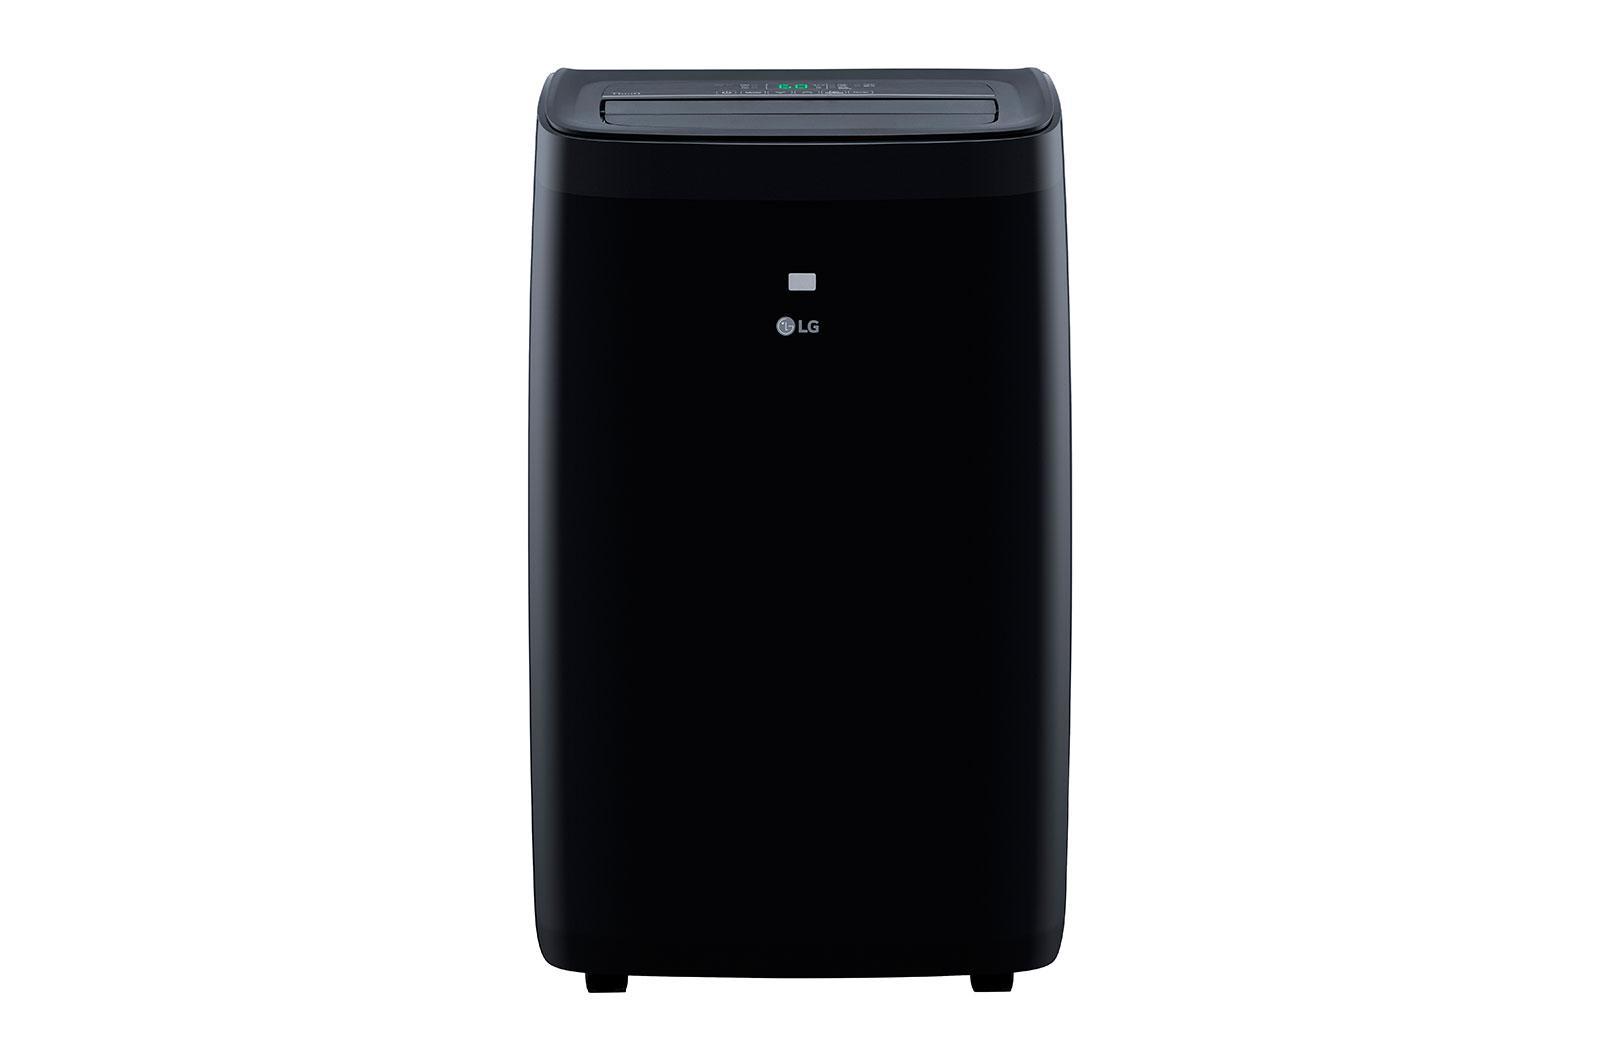 LG Appliances10,000 Btu Smart Wi-Fi Portable Air Conditioner